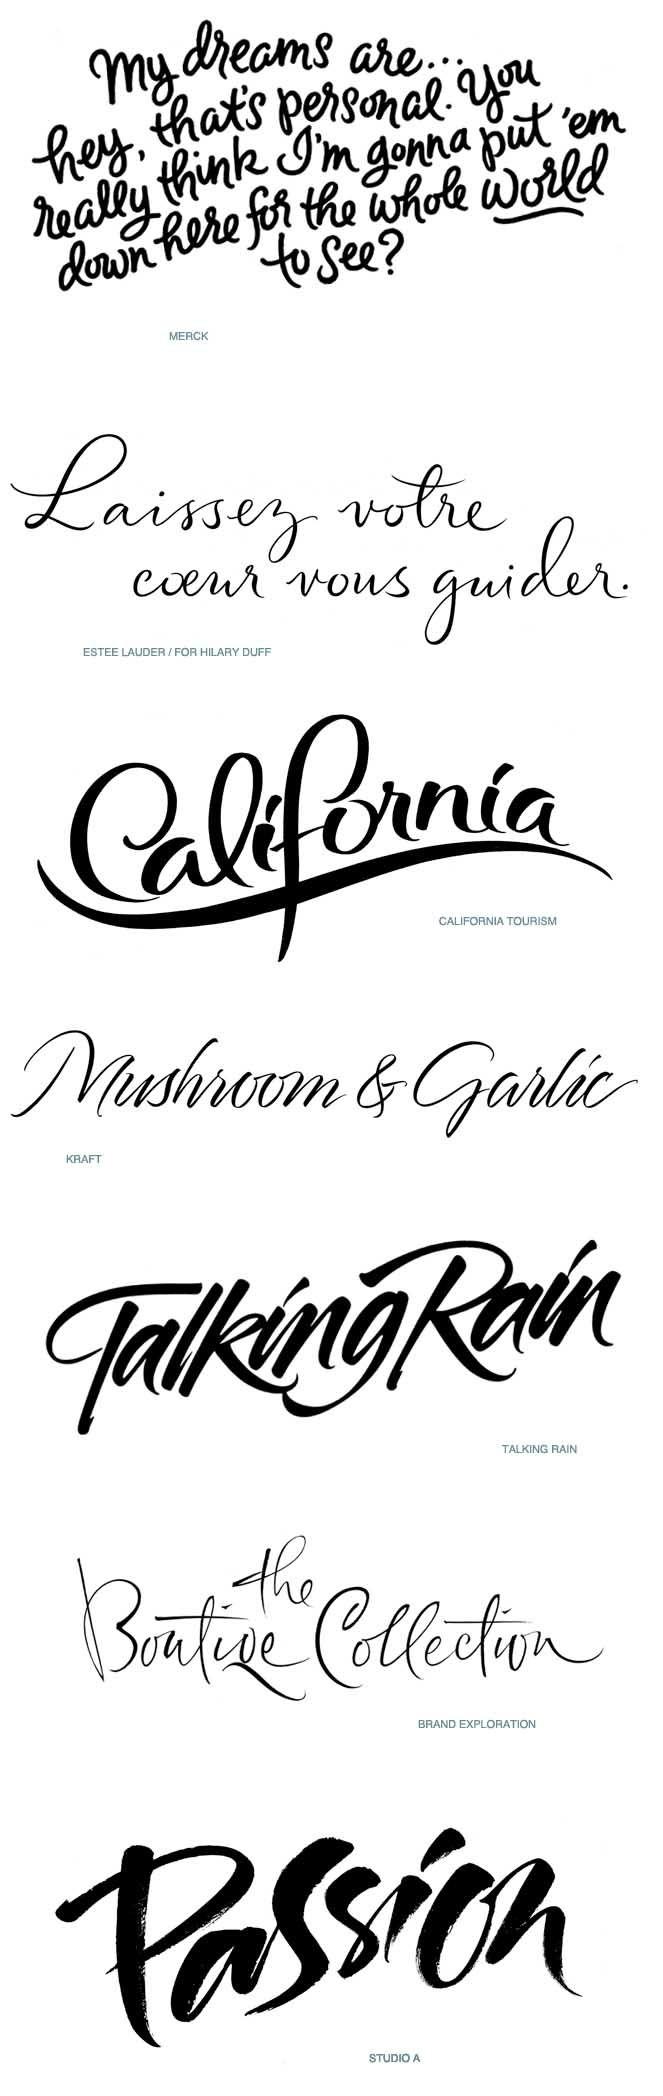 Httpalphabetroadtriptypepada hand lettering for advertising iskra design thecheapjerseys Choice Image